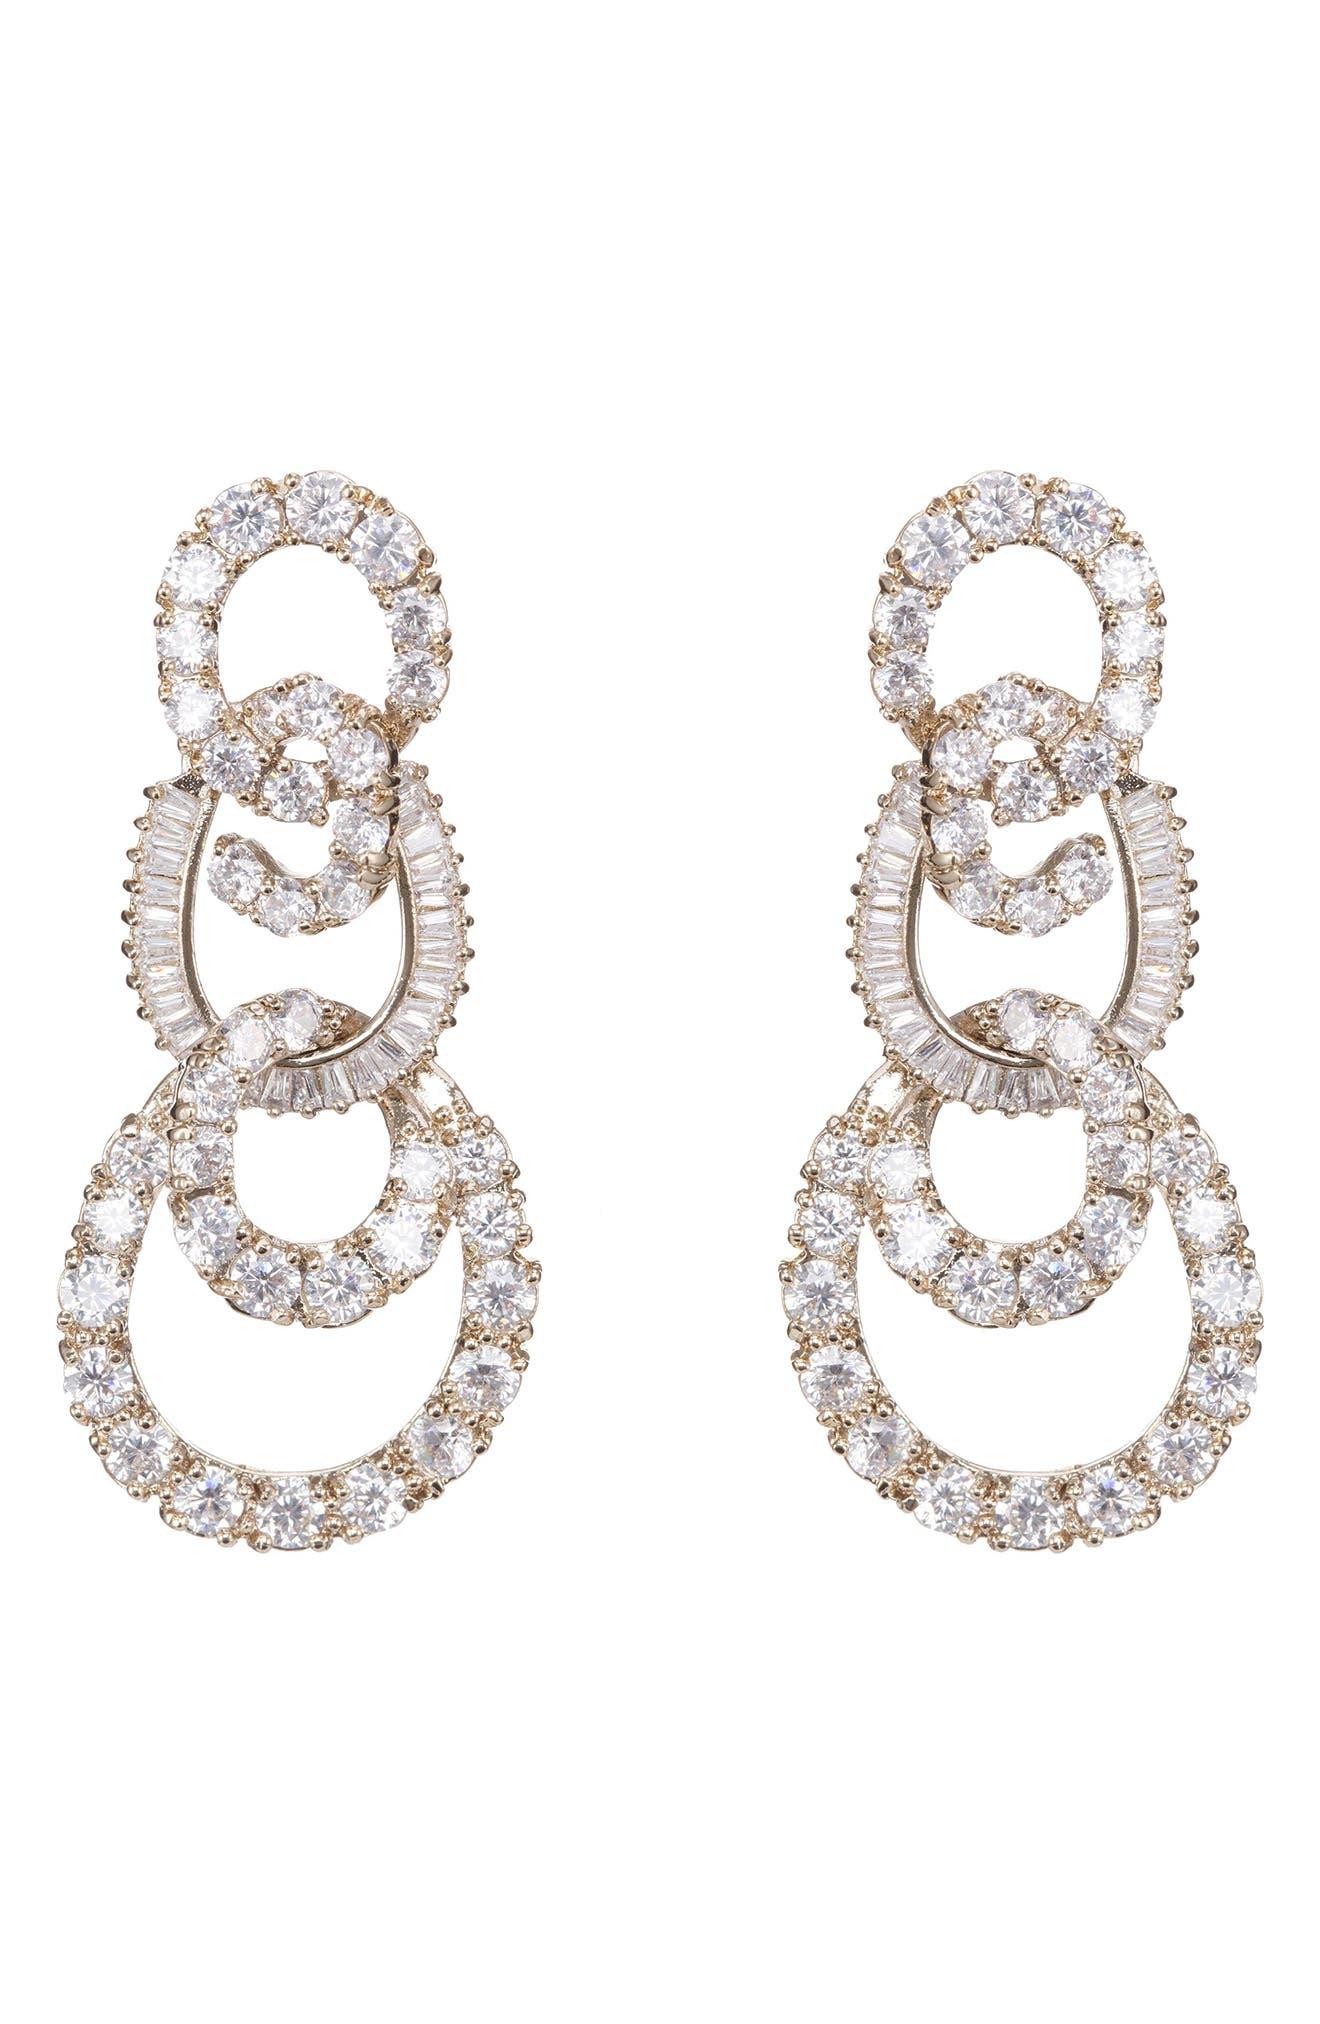 3-Tier Swirl Drop Earrings,                             Alternate thumbnail 3, color,                             White/ Gold